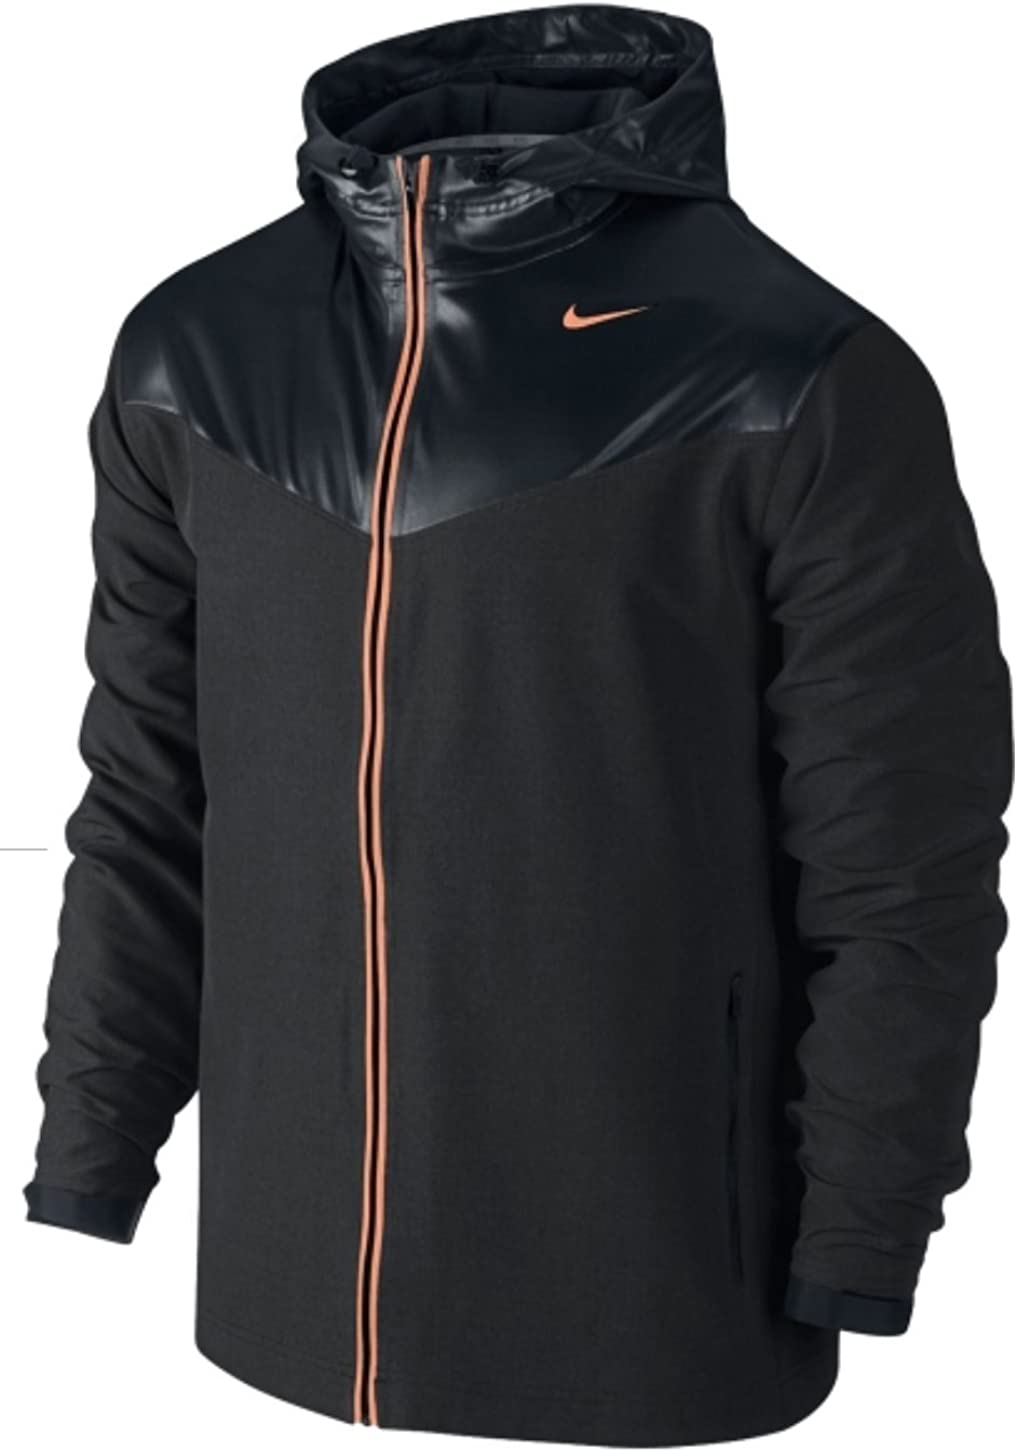 NIKE Sweatless Hooded Men's Training Jacket